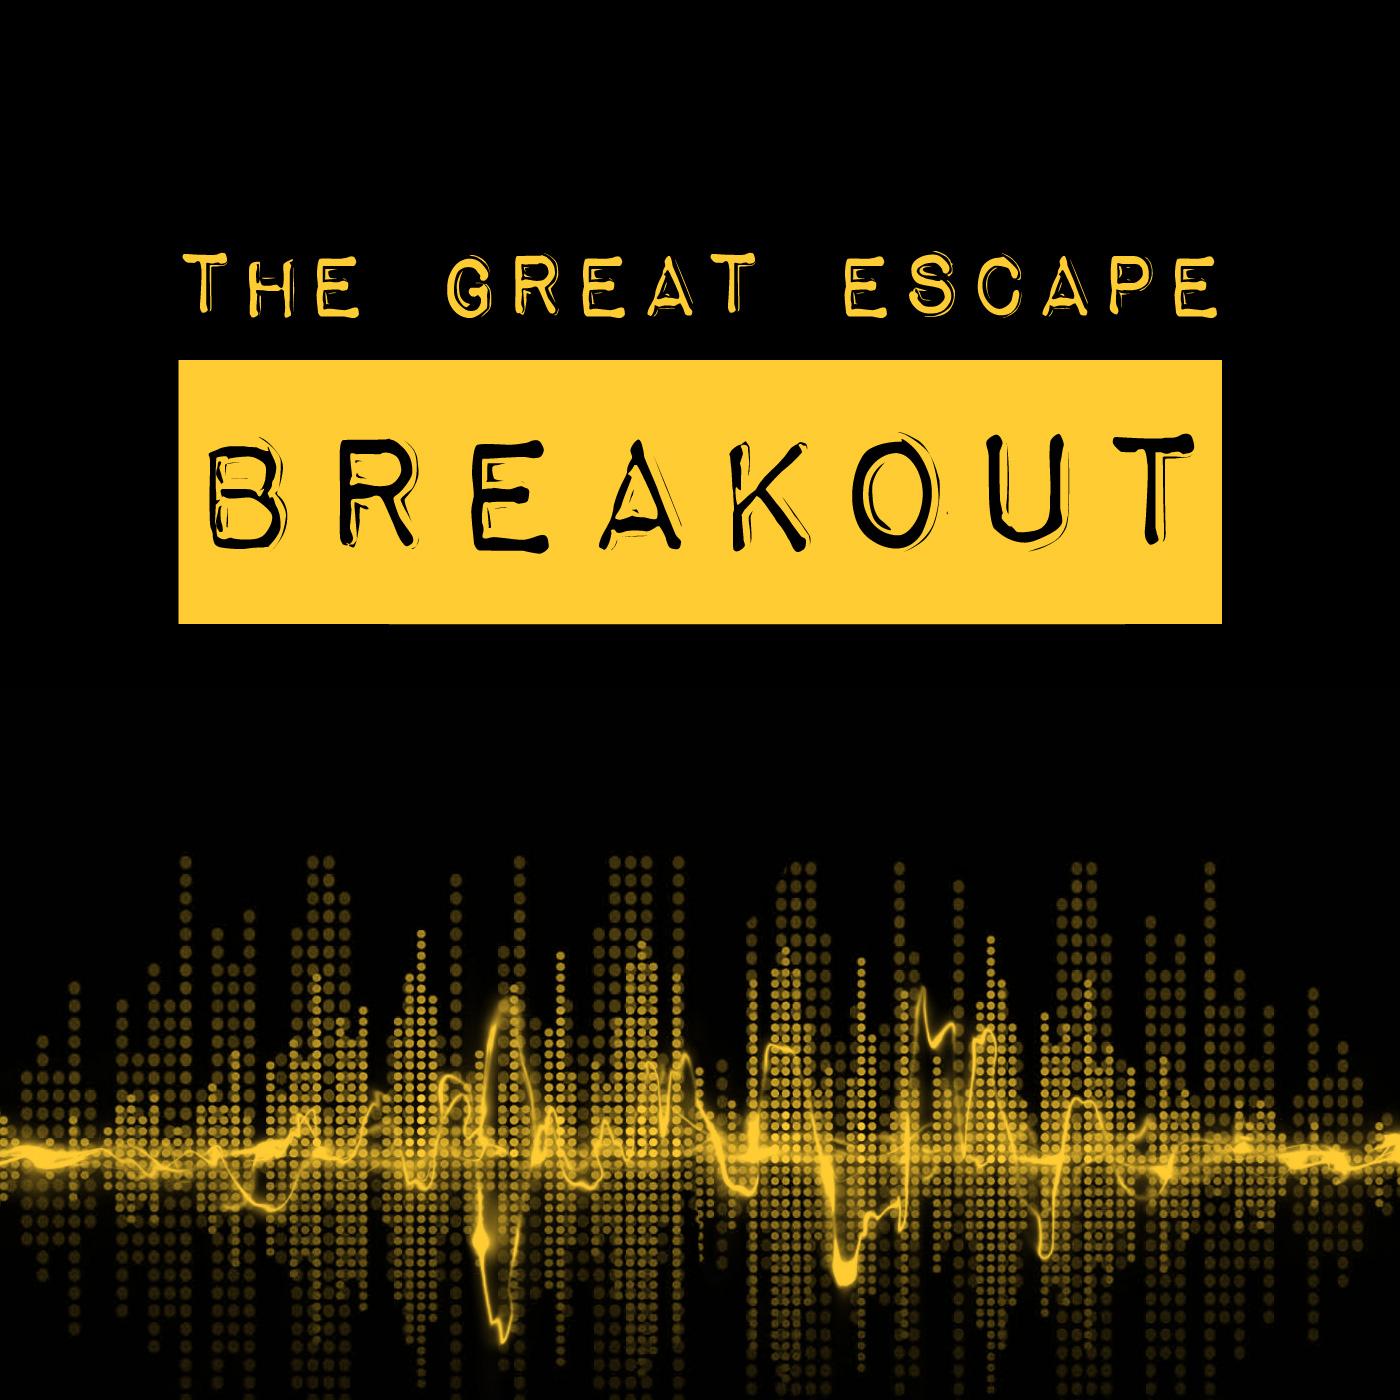 The Great Escape Breakout